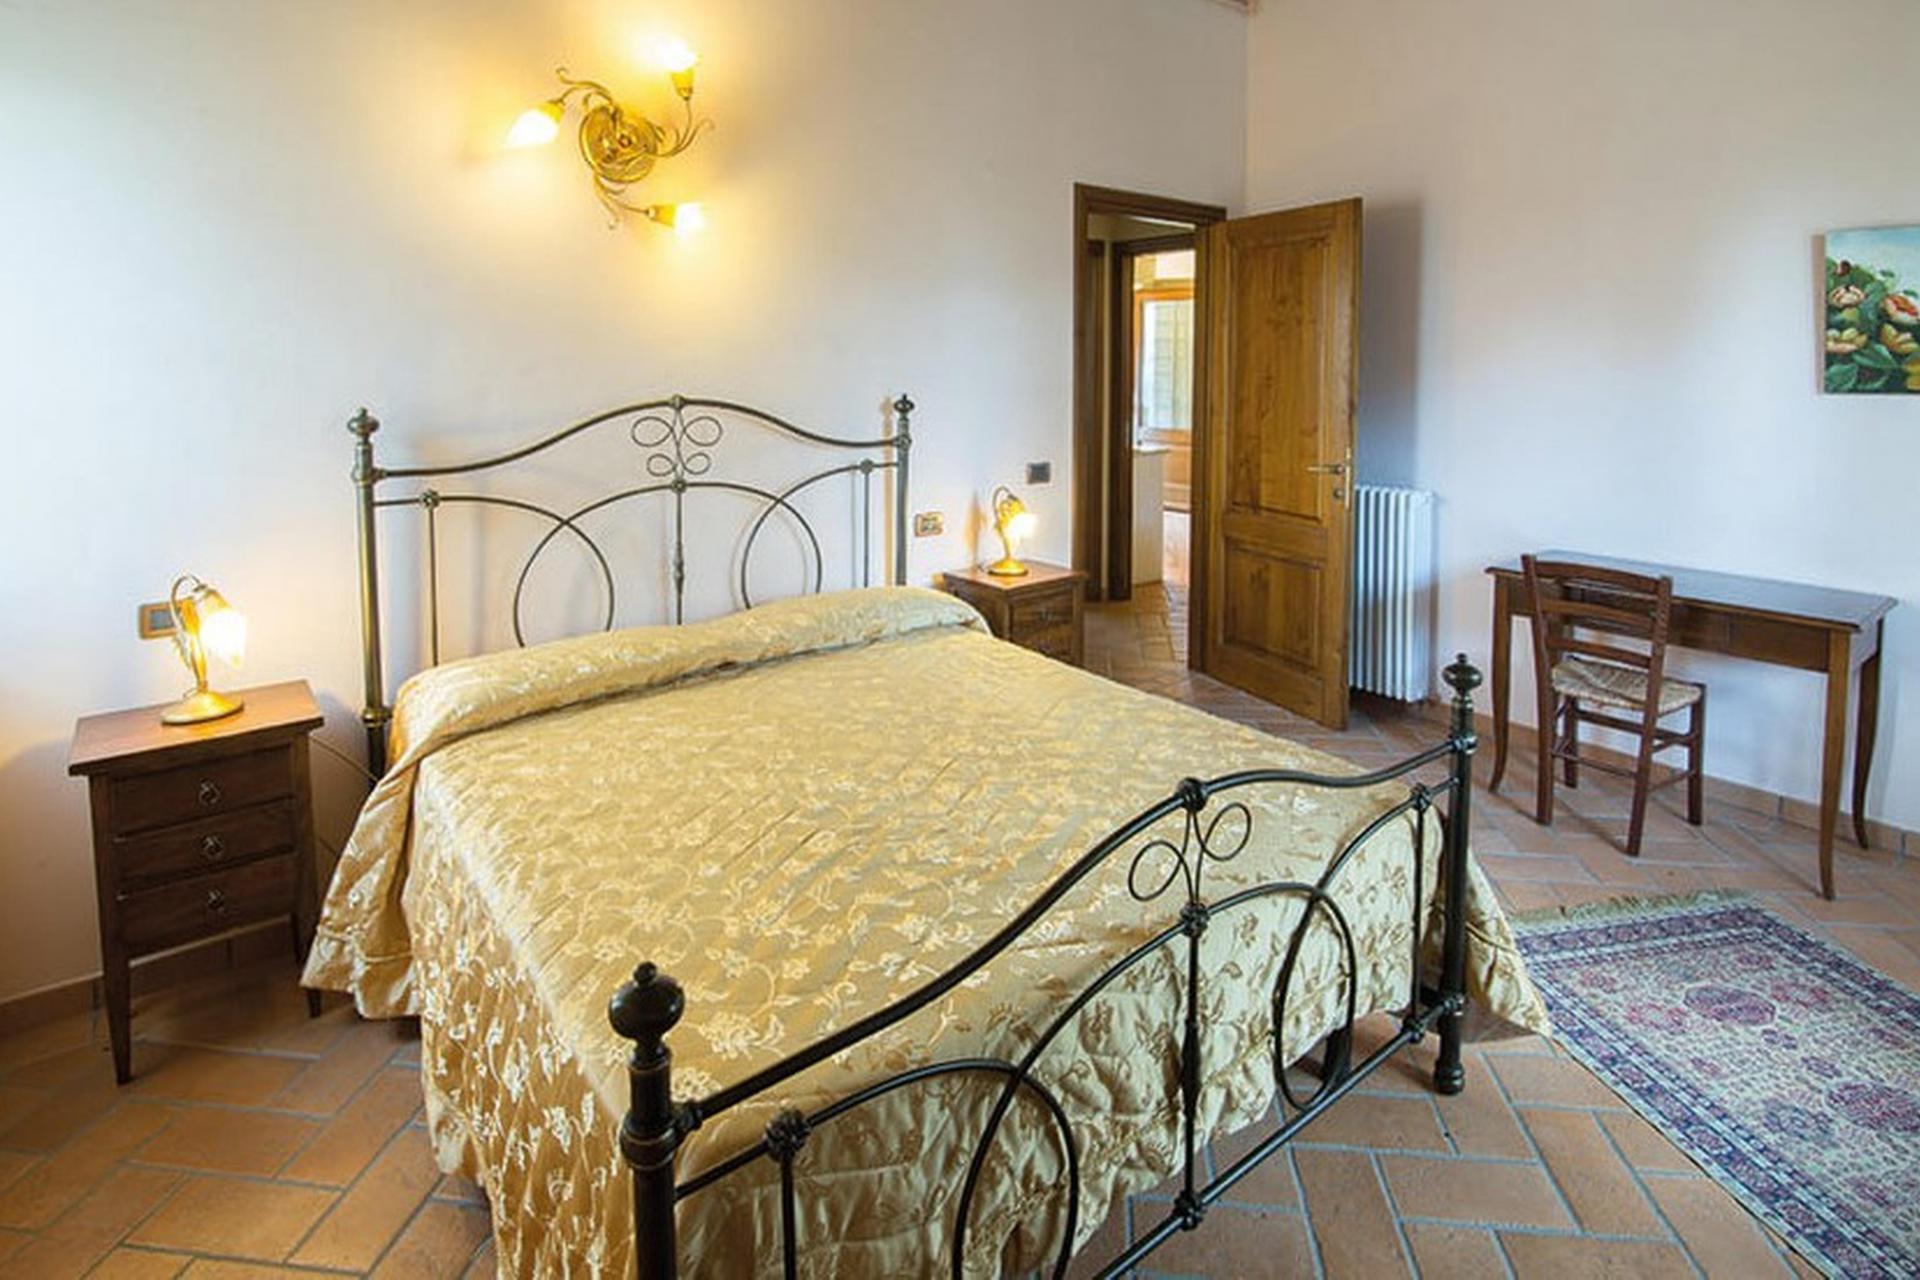 Agriturismo Toscane Agriturismo Toscane, gastvrij en la mamma in de keuken